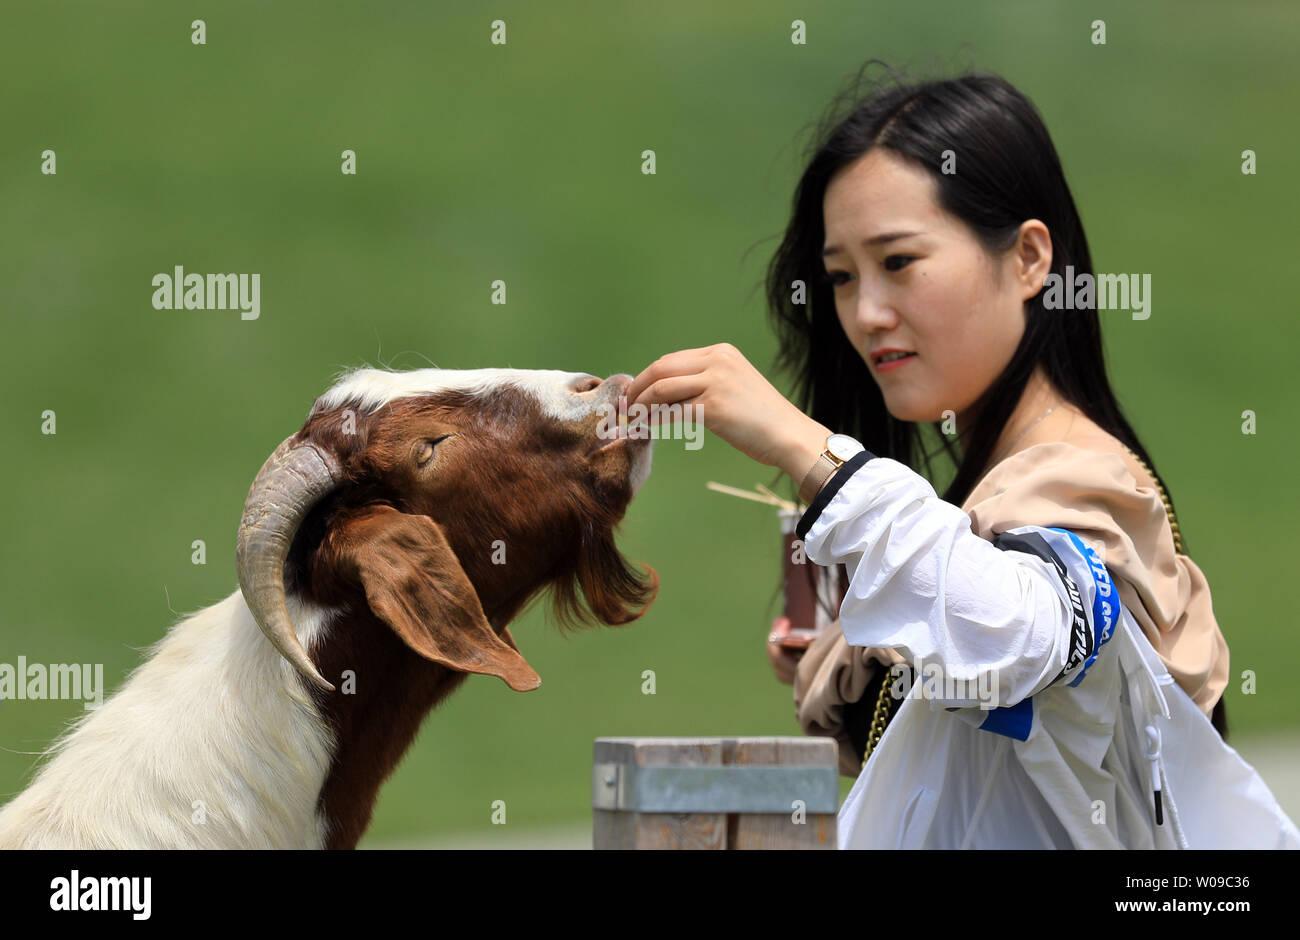 (190627) -- DALIAN, June 27, 2019 (Xinhua) -- A tourist feeds a goat at Sanhuan pastureland in Dalian, northeast China's Liaoning Province, June 26, 2019. (Xinhua/Yao Jianfeng) - Stock Image